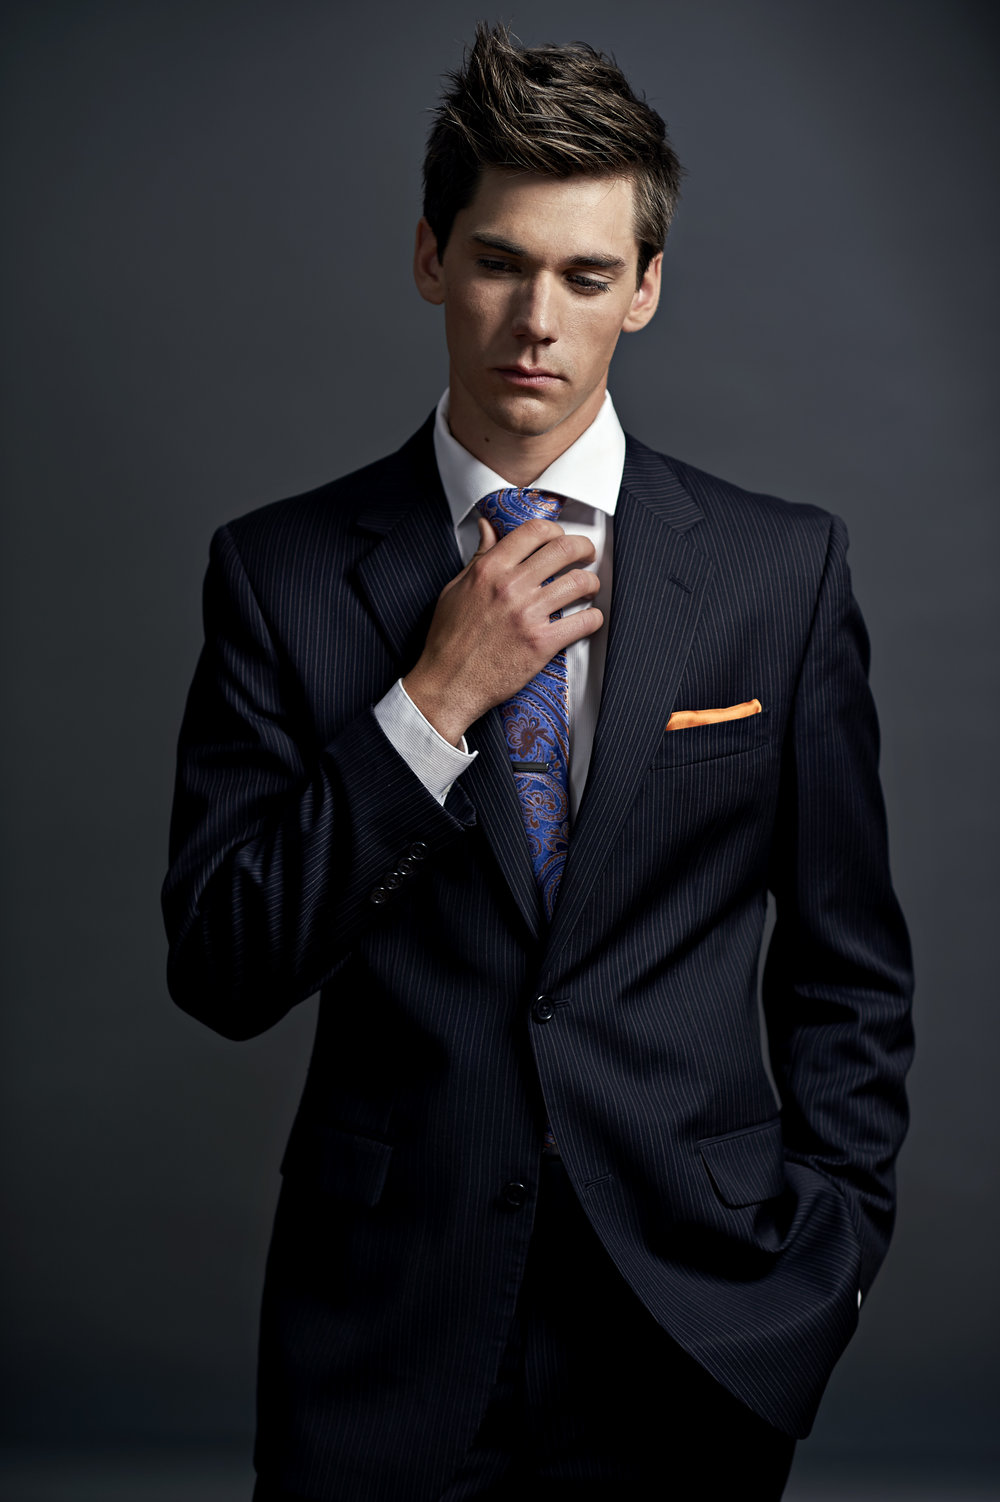 Marta-Hewson-male-model-portfolio-shoot-8467.jpg